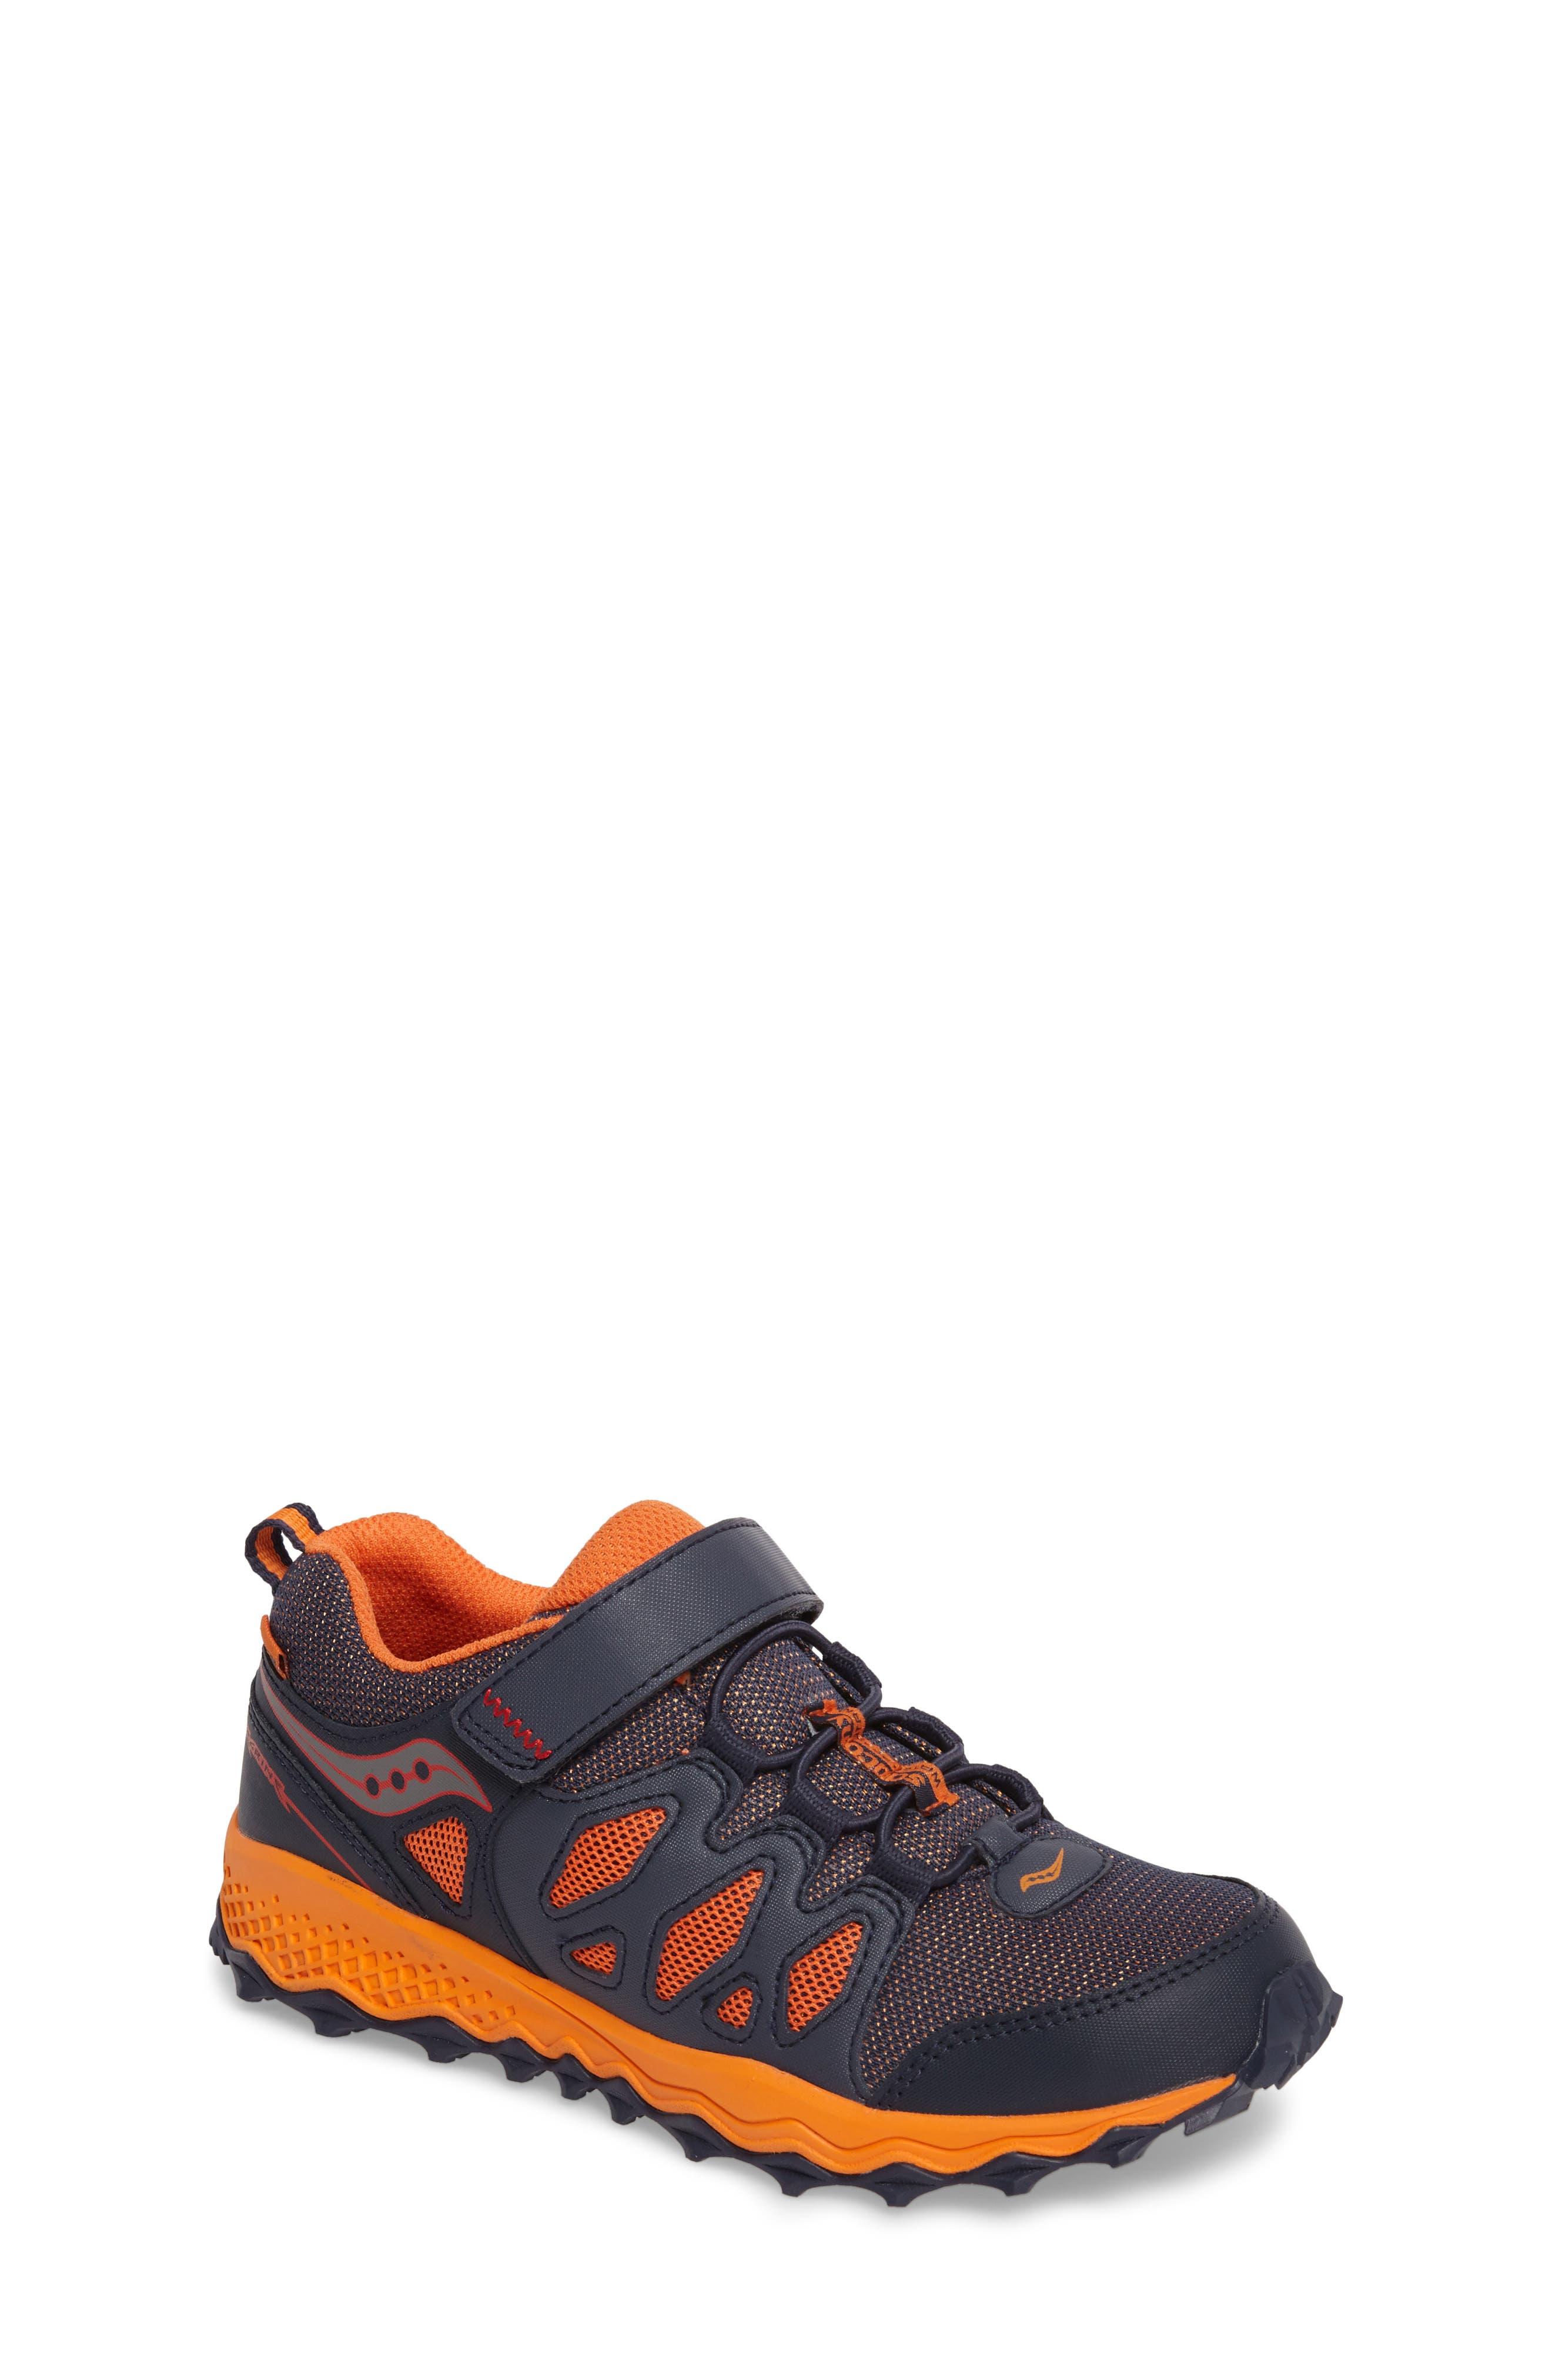 Peregrine Shield Water-Resistant Sneaker,                             Main thumbnail 1, color,                             Navy/ Orange